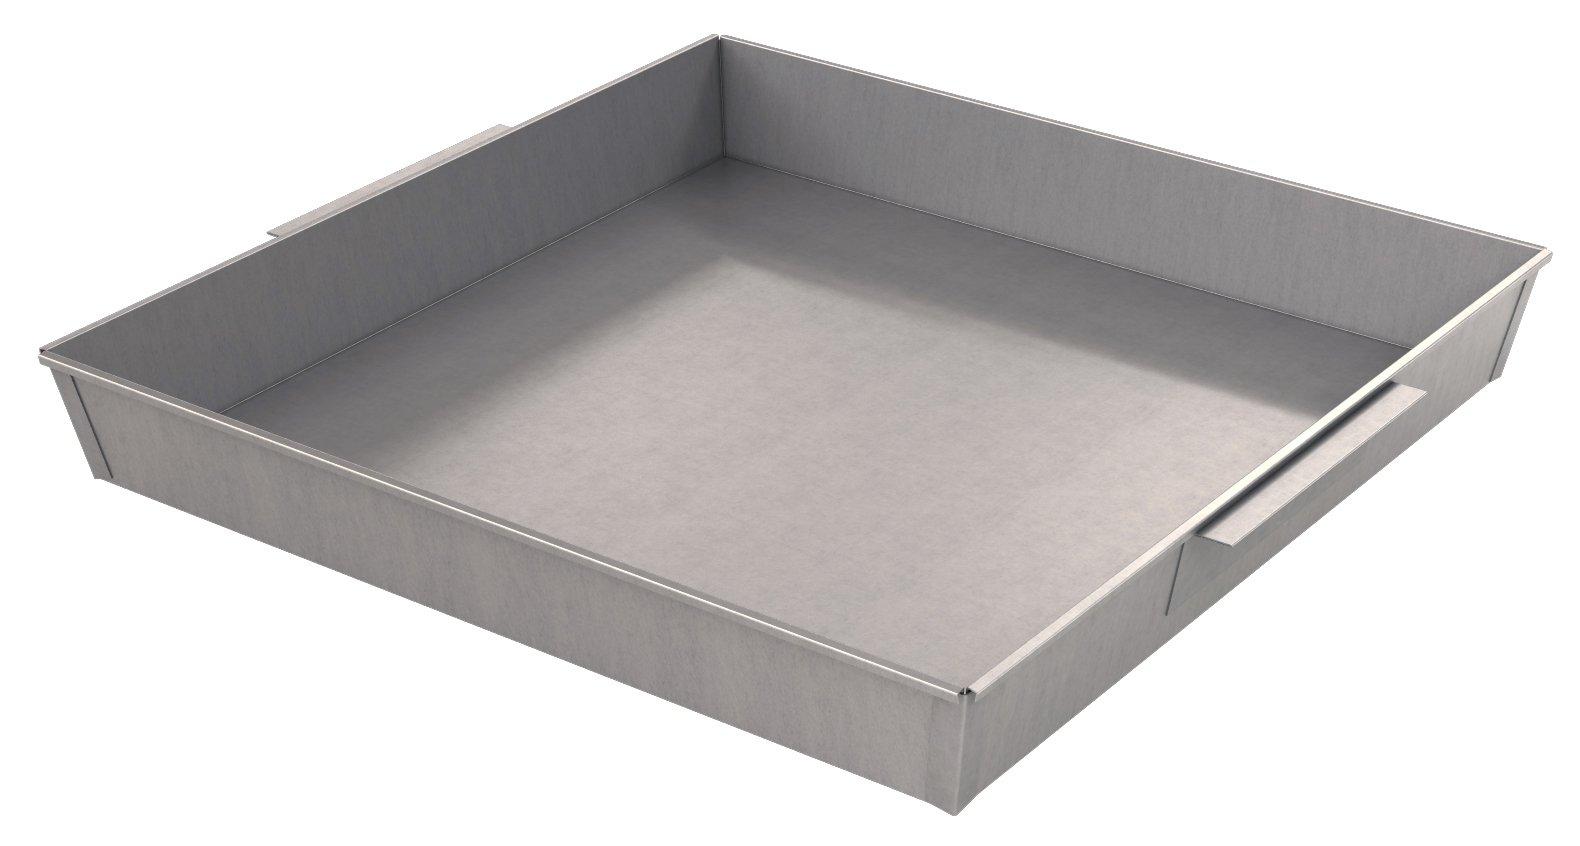 Bon 12-716 Galvanized Slump Test Pan, 24-Inch by 24-Inch